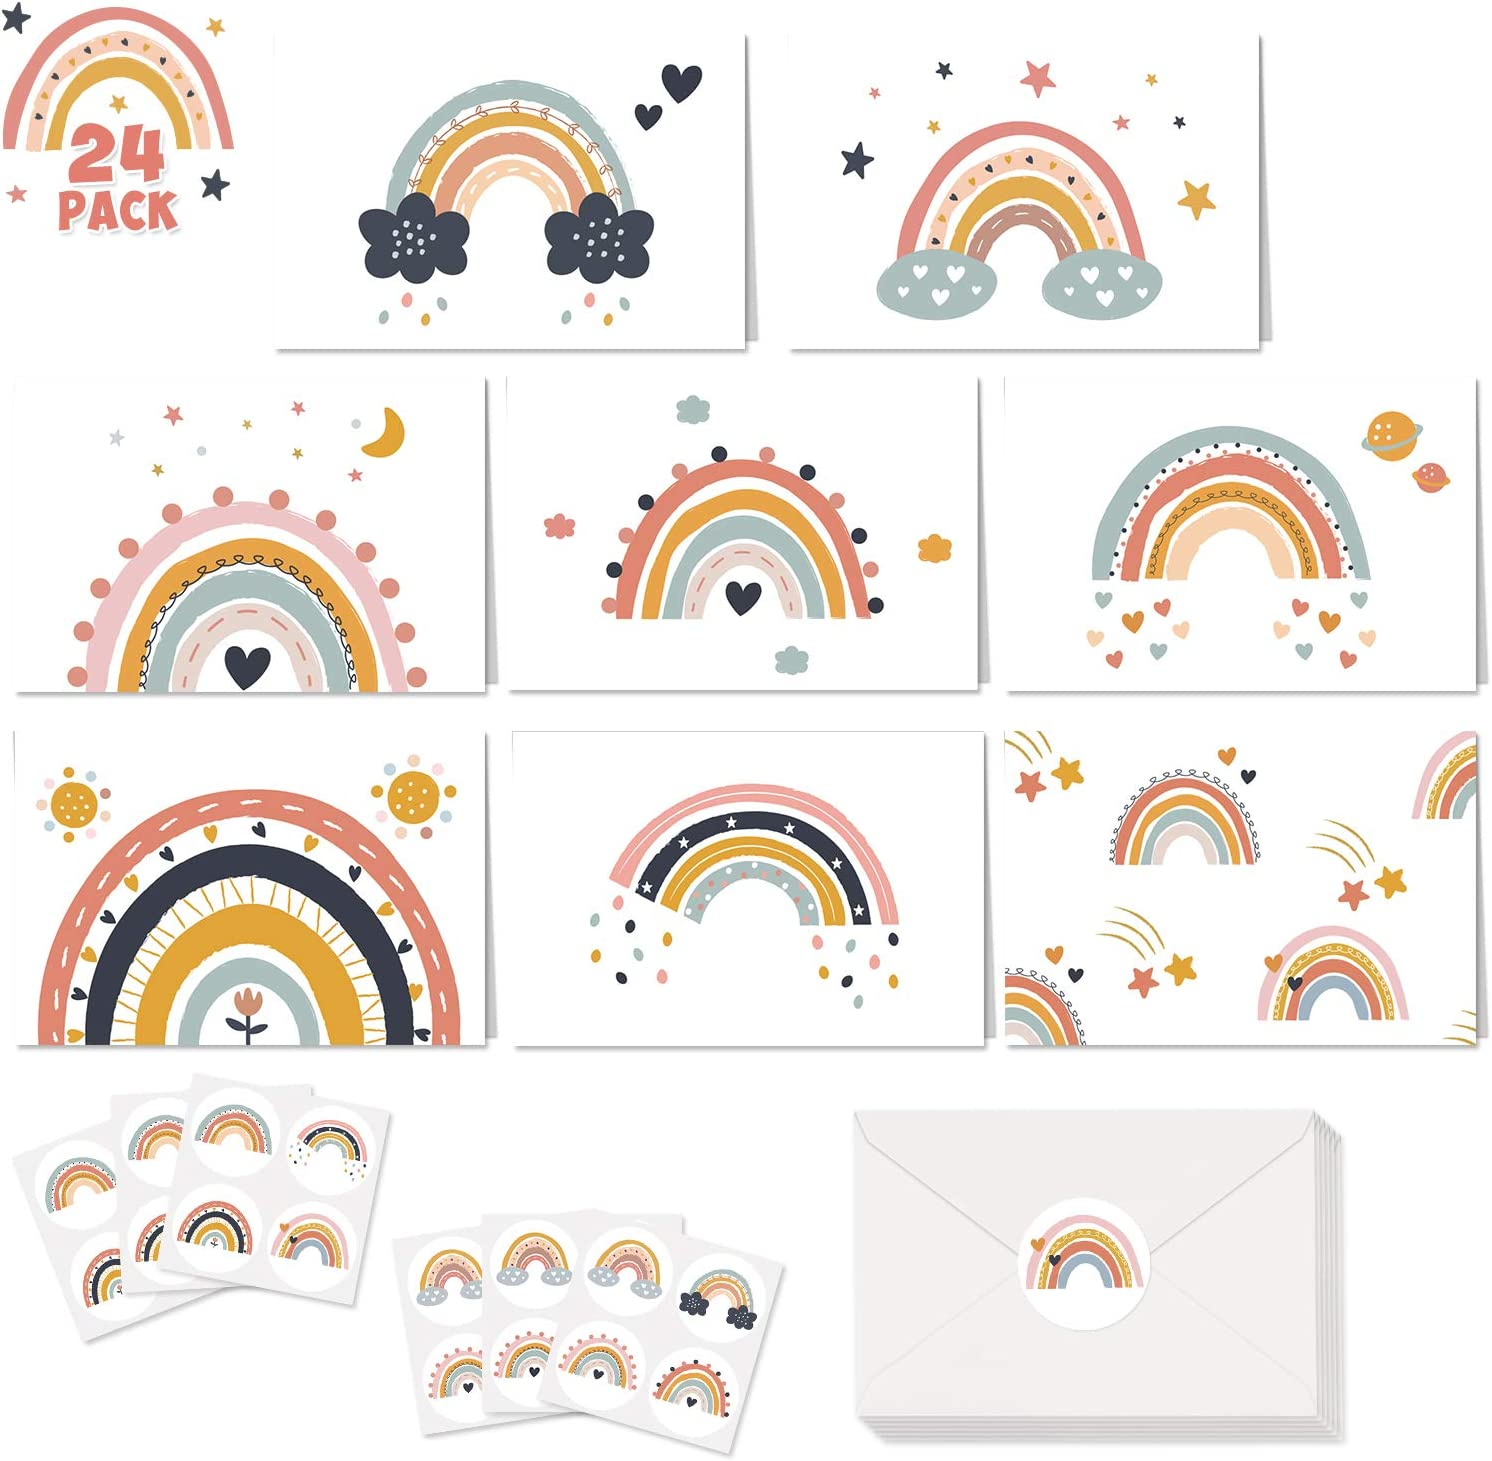 Boho Rainbow Muted Rainbow Party Boho Rainbow Party Supplies Bohemian Rainbow Muted Rainbow Favors Boho Muted Rainbow Applesauce